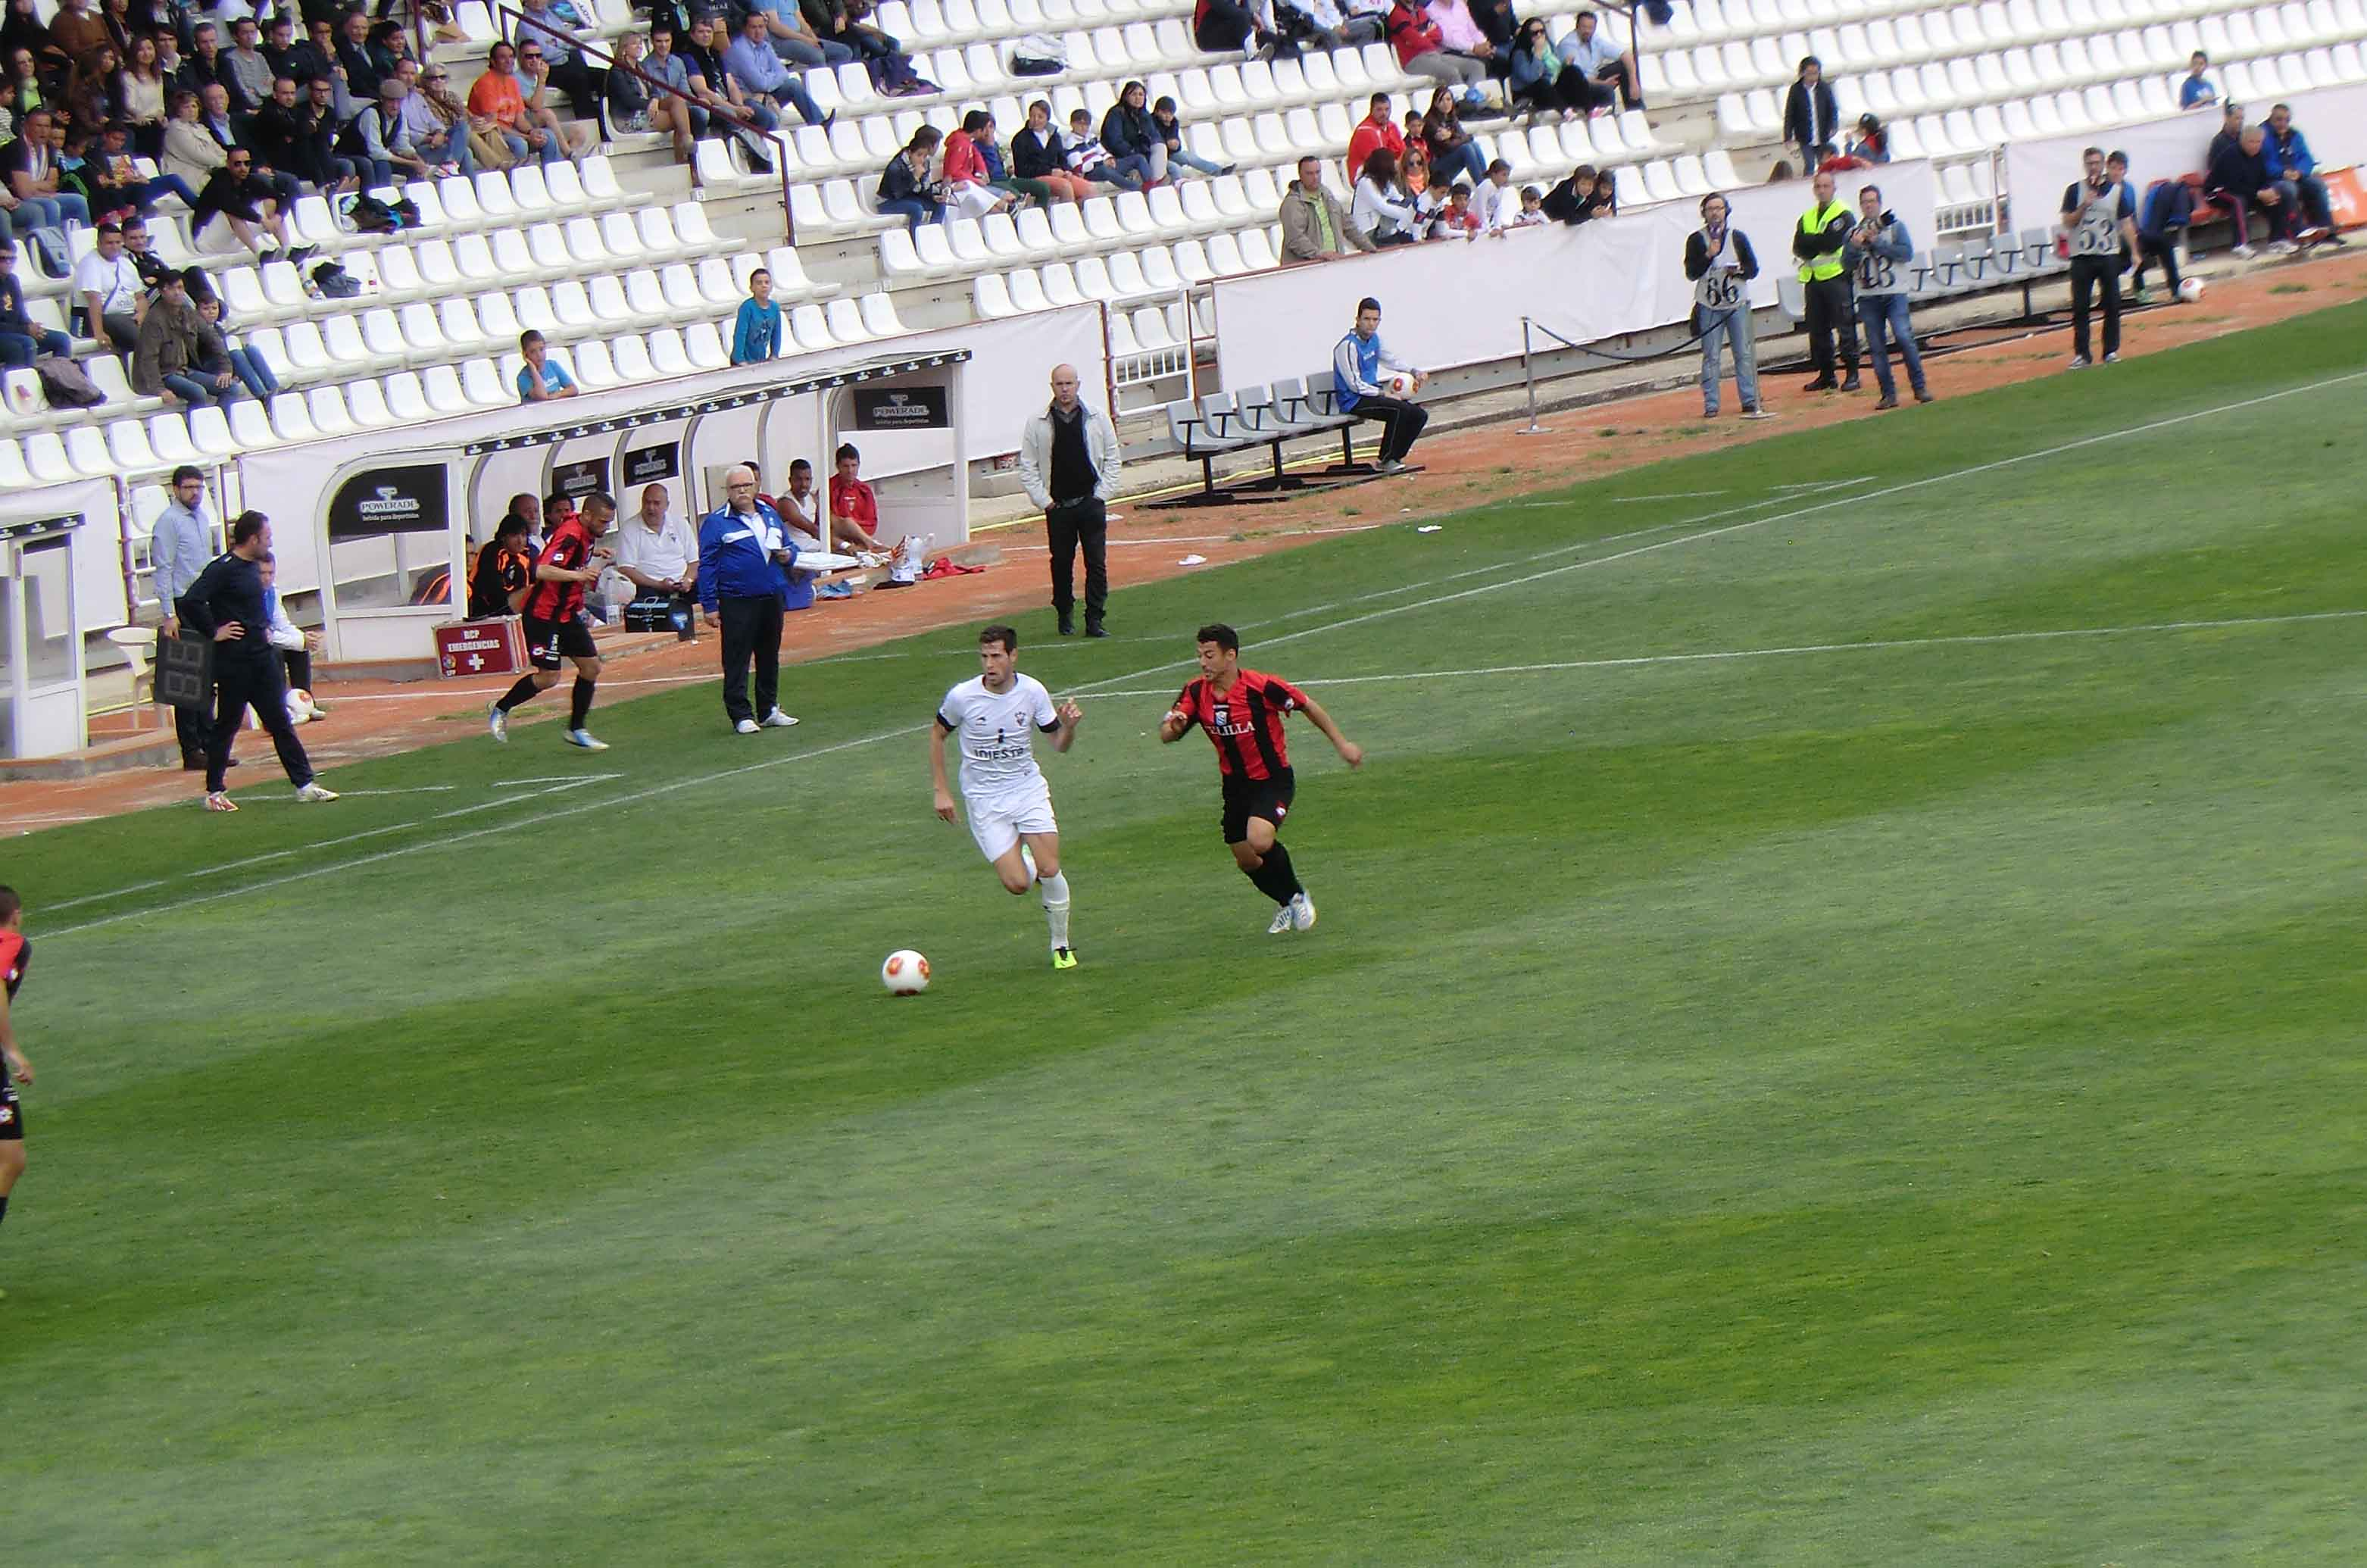 Albacete Balompié - UD Melilla (Foto: Pilar García)